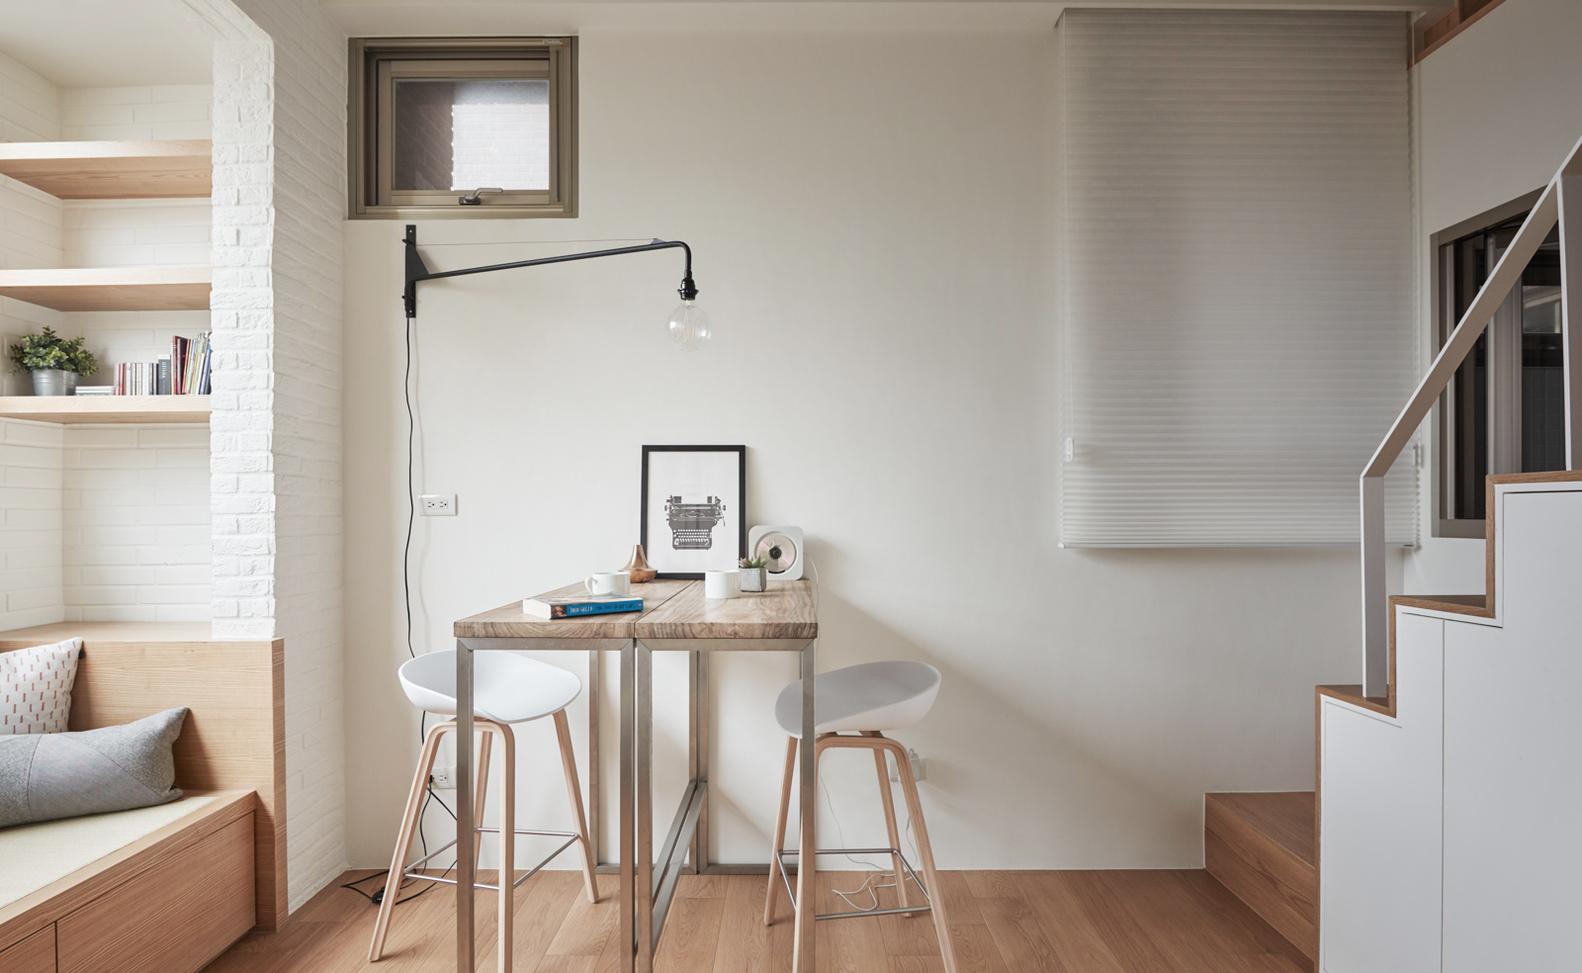 22 Sq M Apartment Interior In Taiwan Viskas Apie Interjer